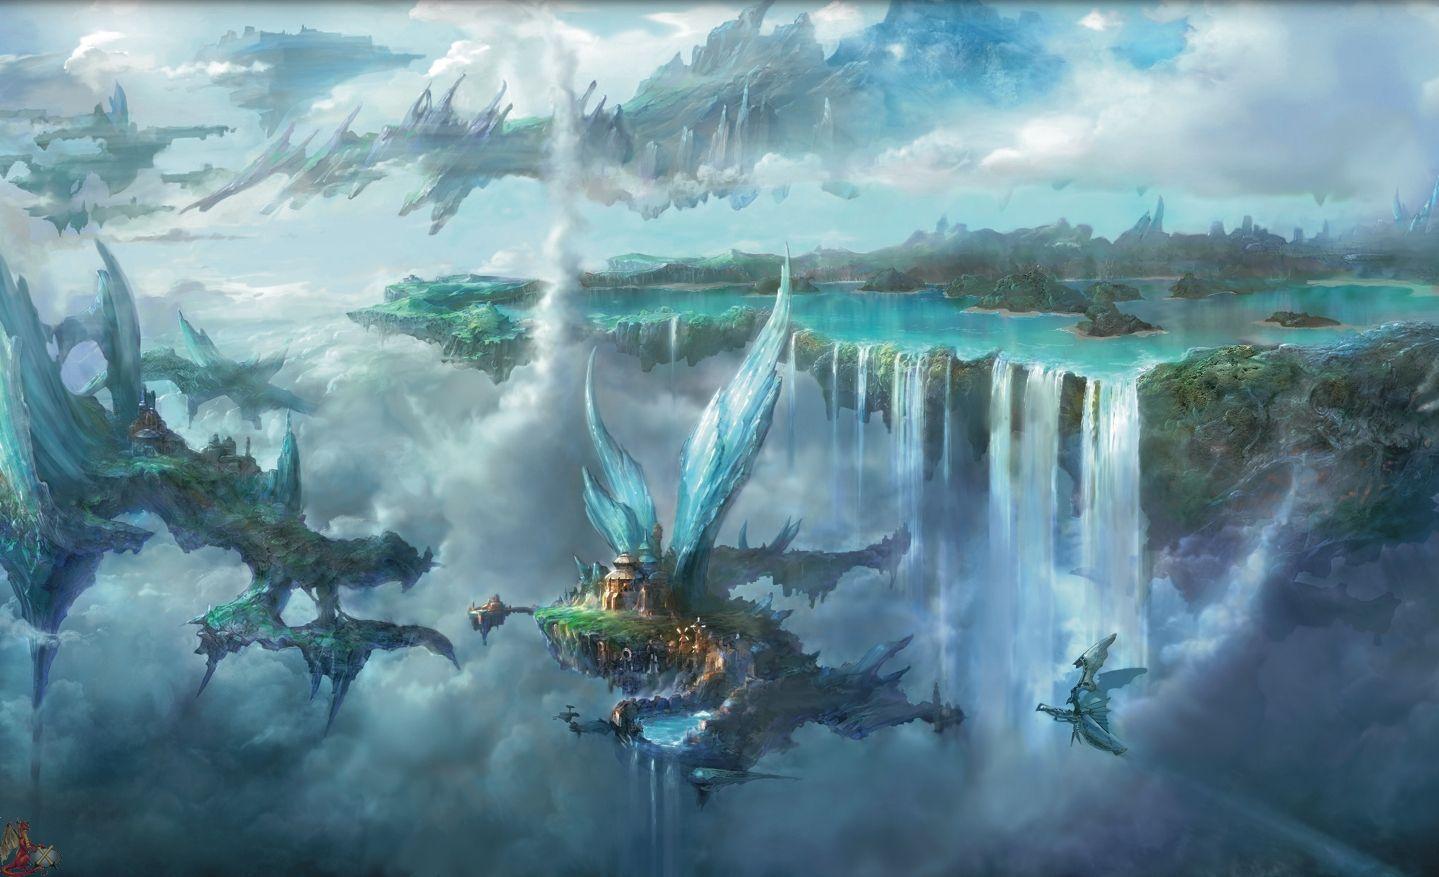 Final Fantasy Landscape Wallpaper